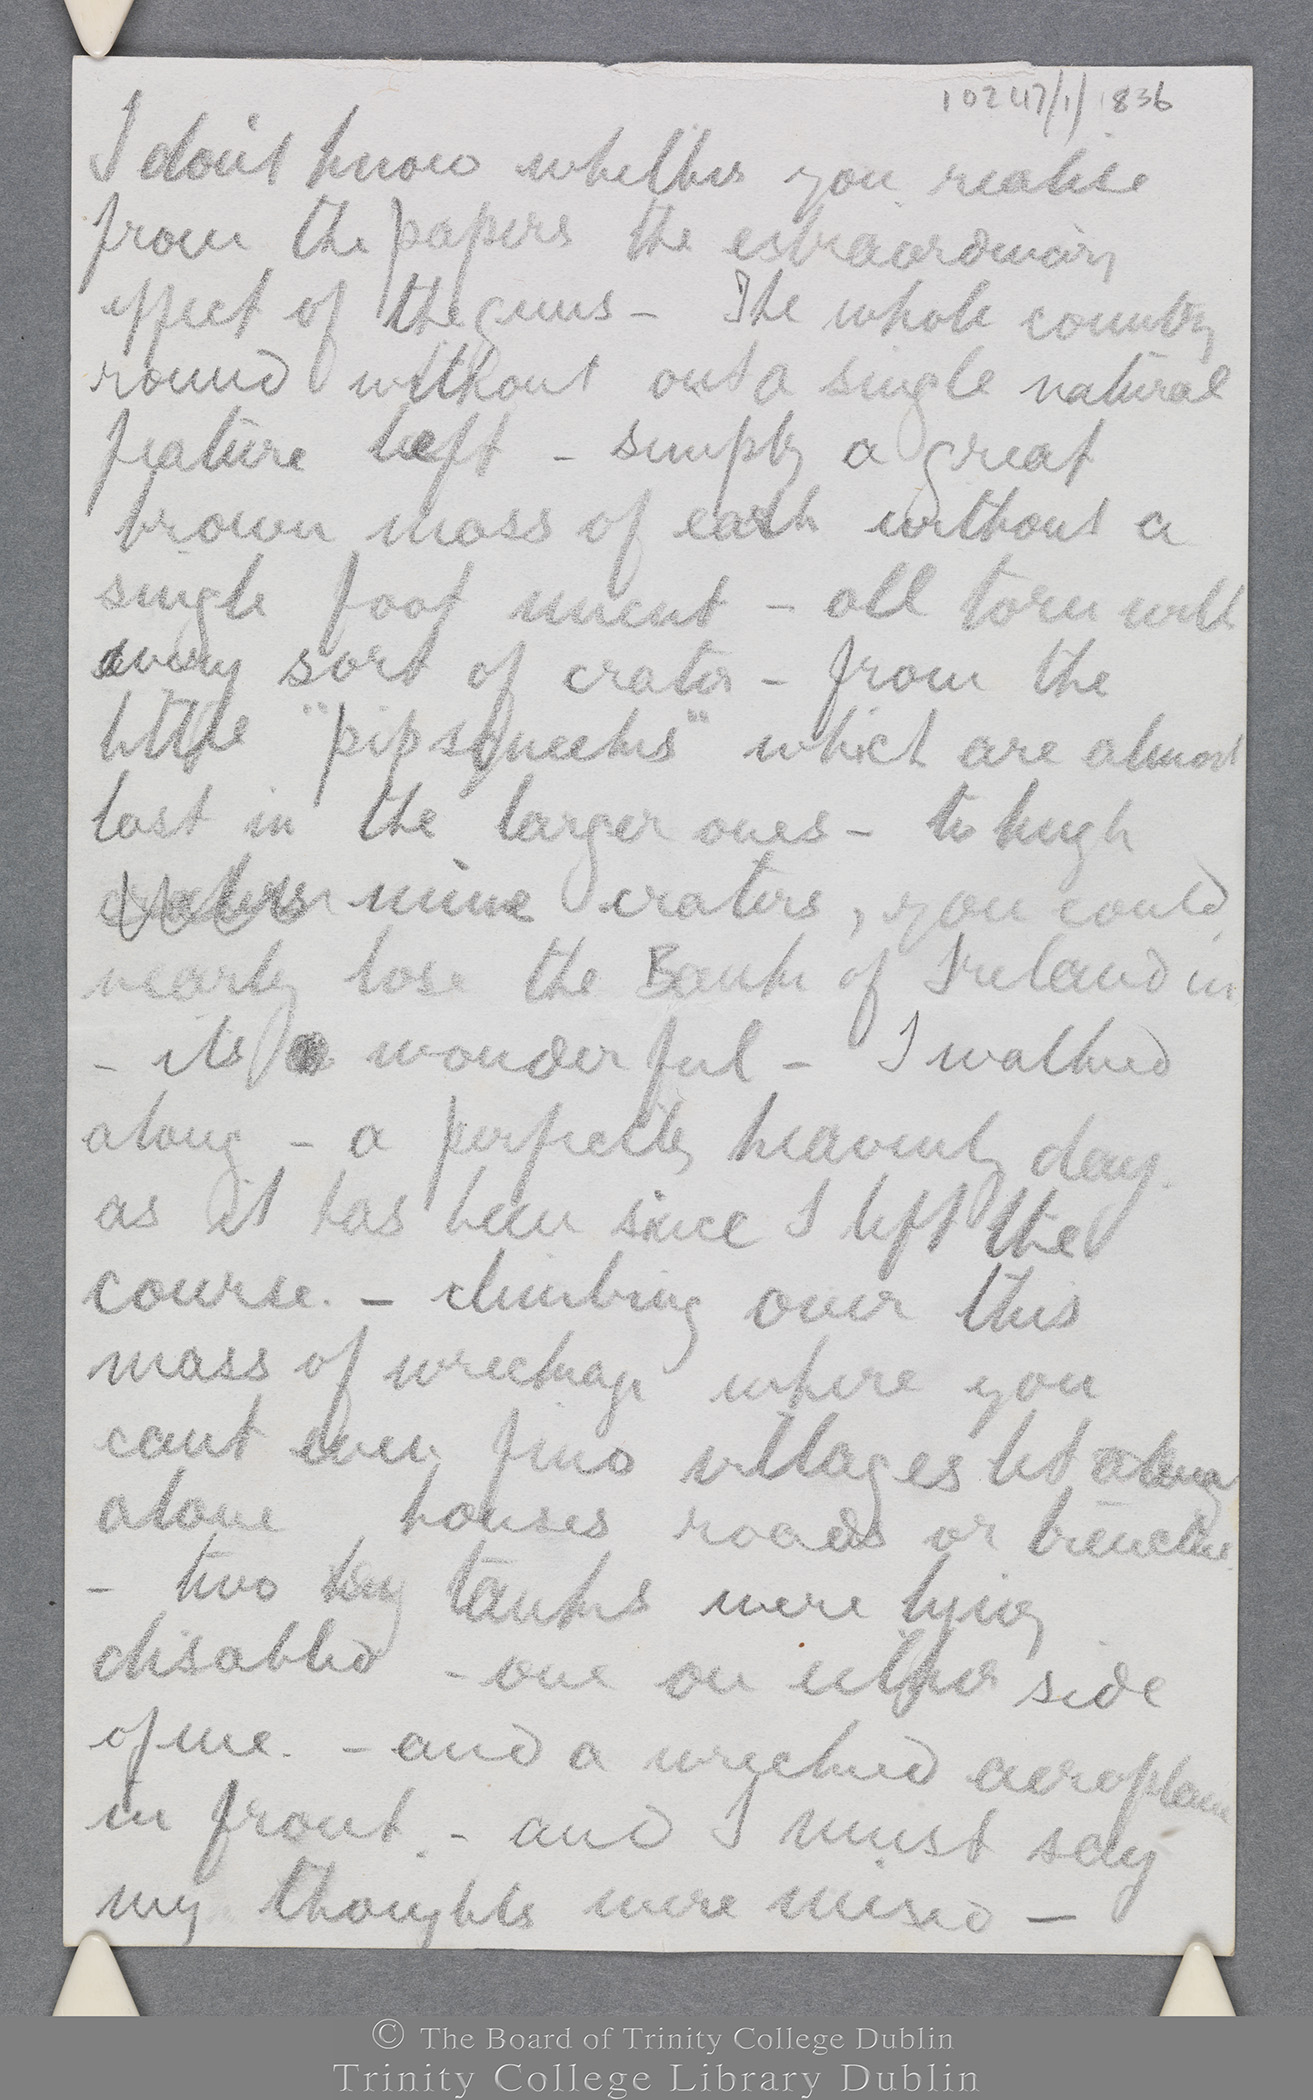 TCD MS 10247/1/836 folio 3 recto